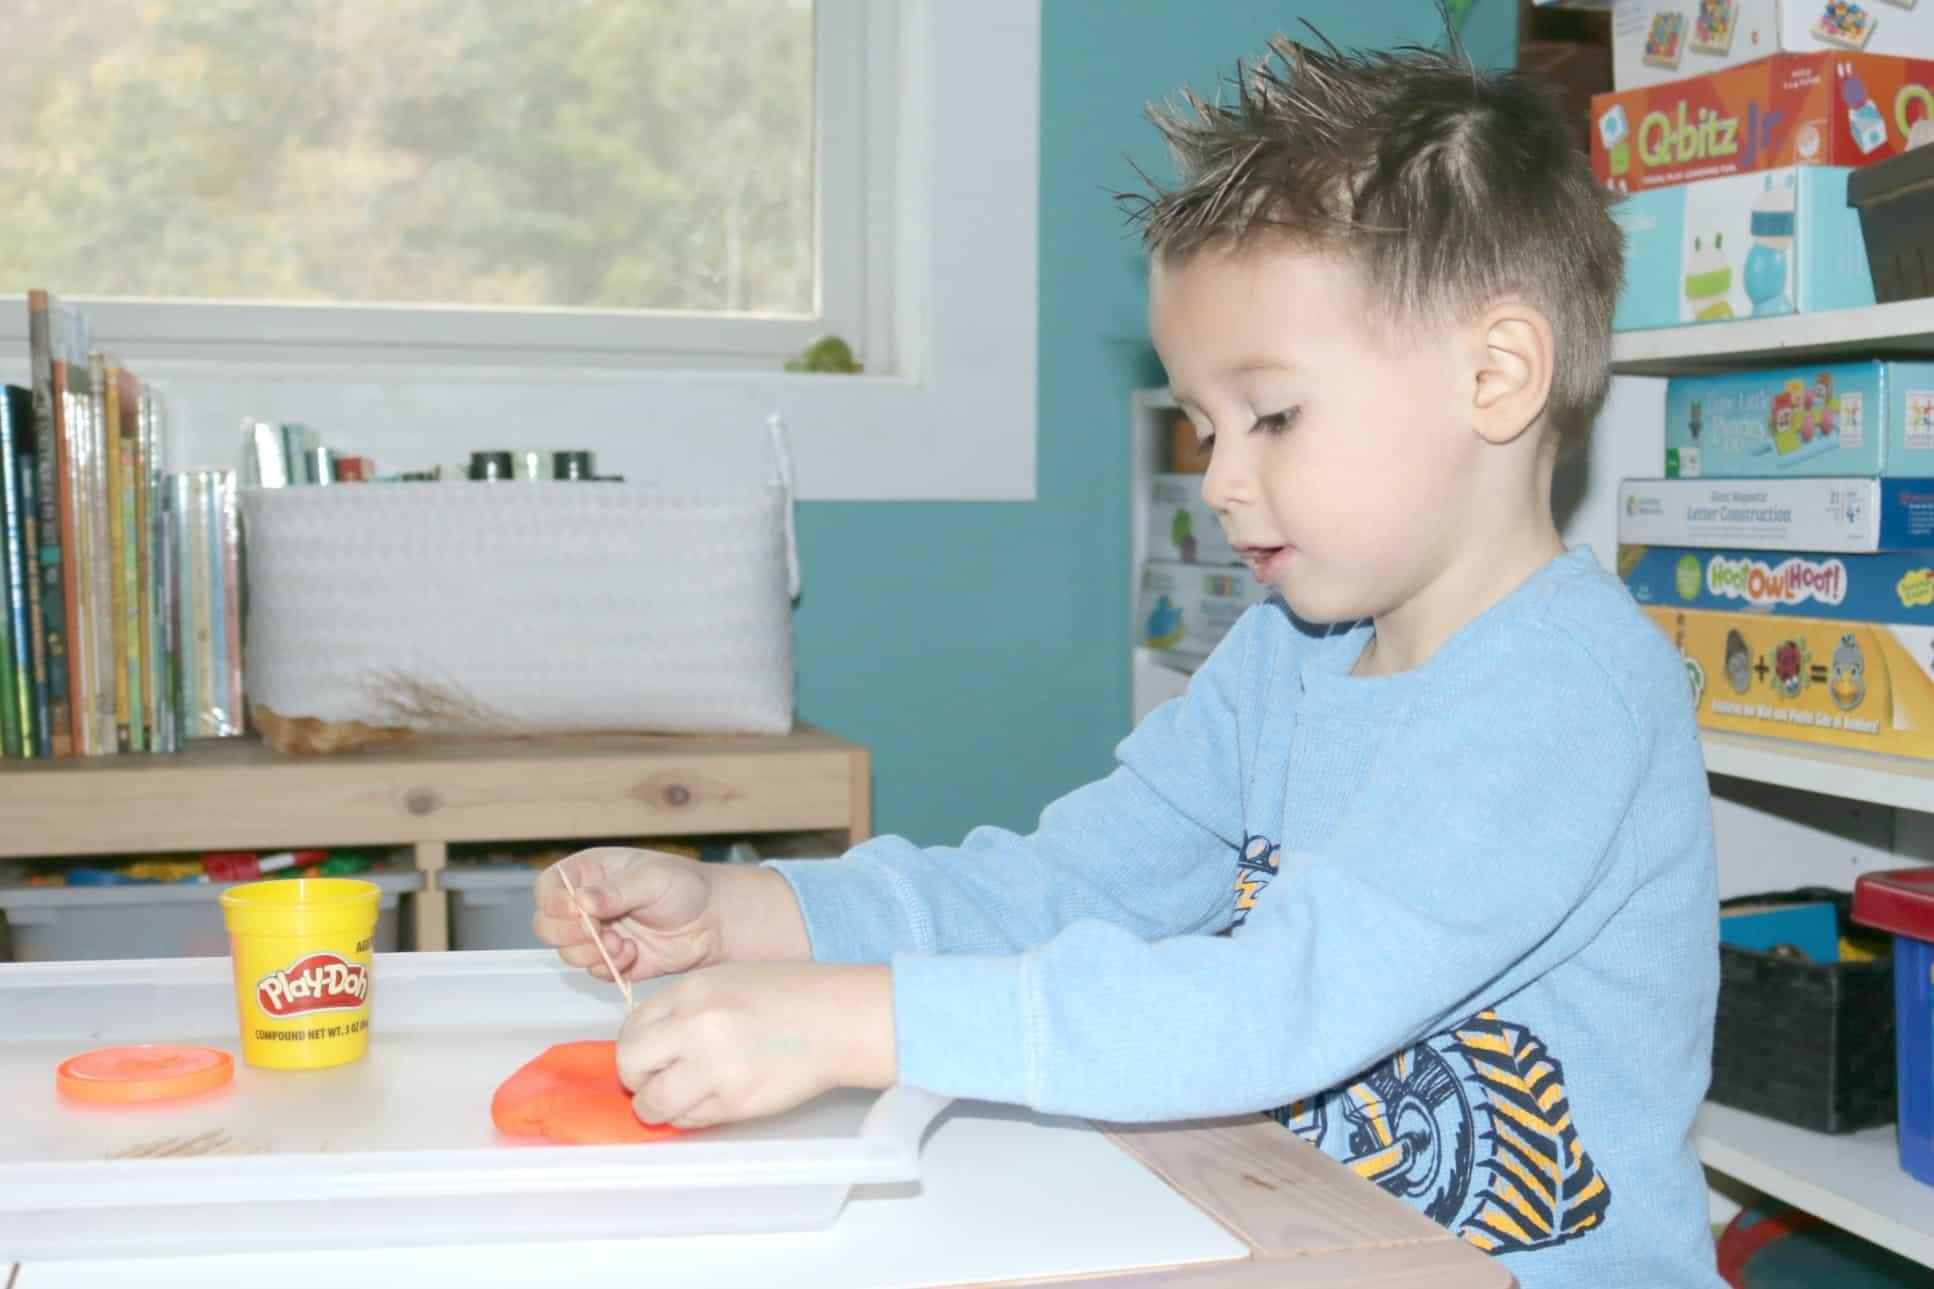 Preschool Orchard Theme Porcupine Quills Sensory Activity for Little Kids